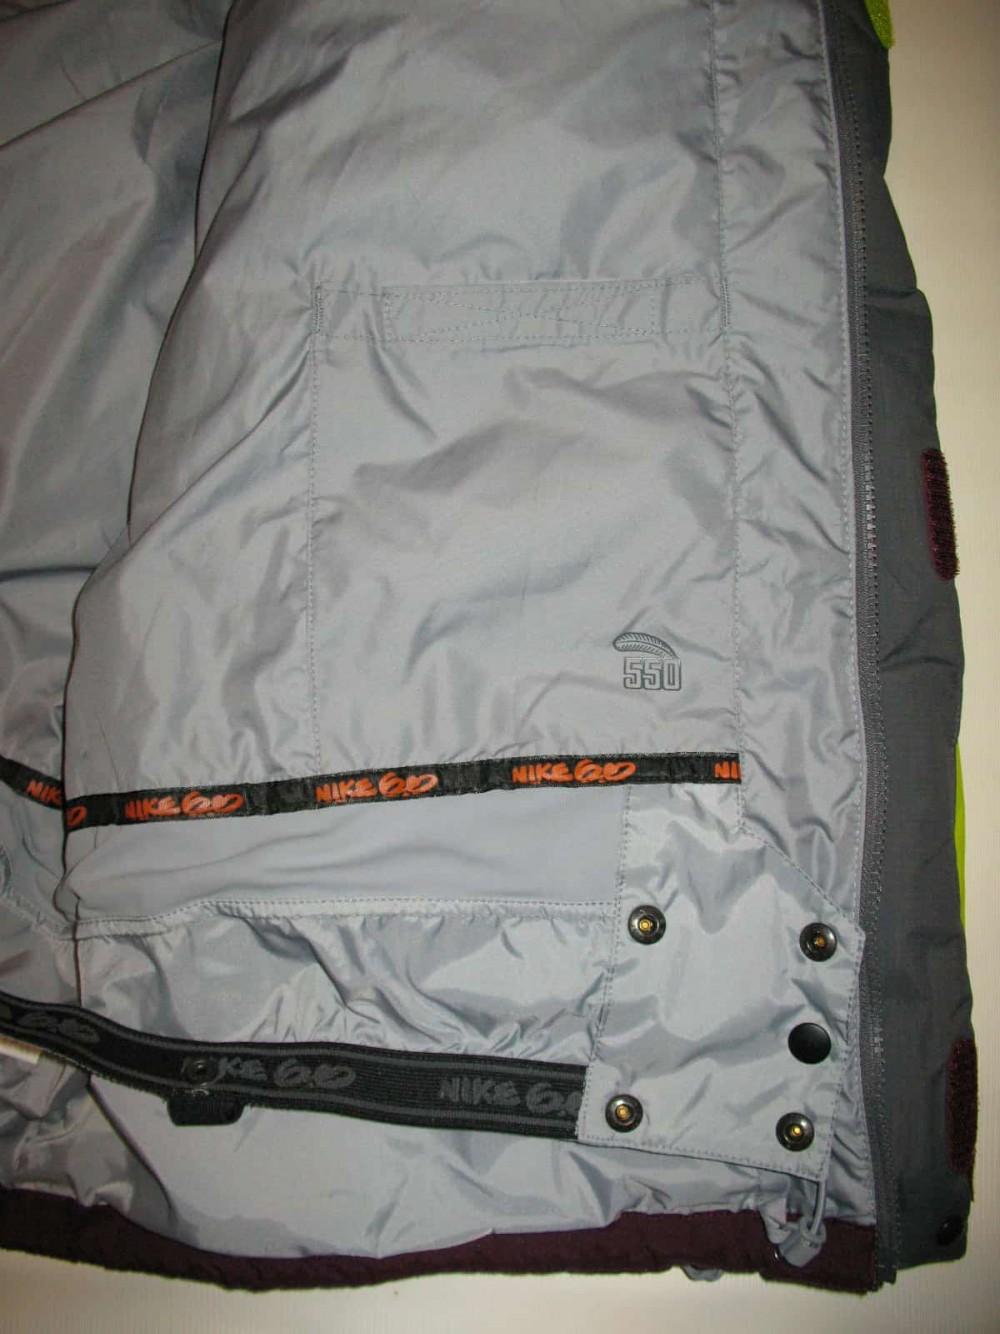 Куртка NIKE 6.0 down jacket (размер XXL/XXXL) - 11